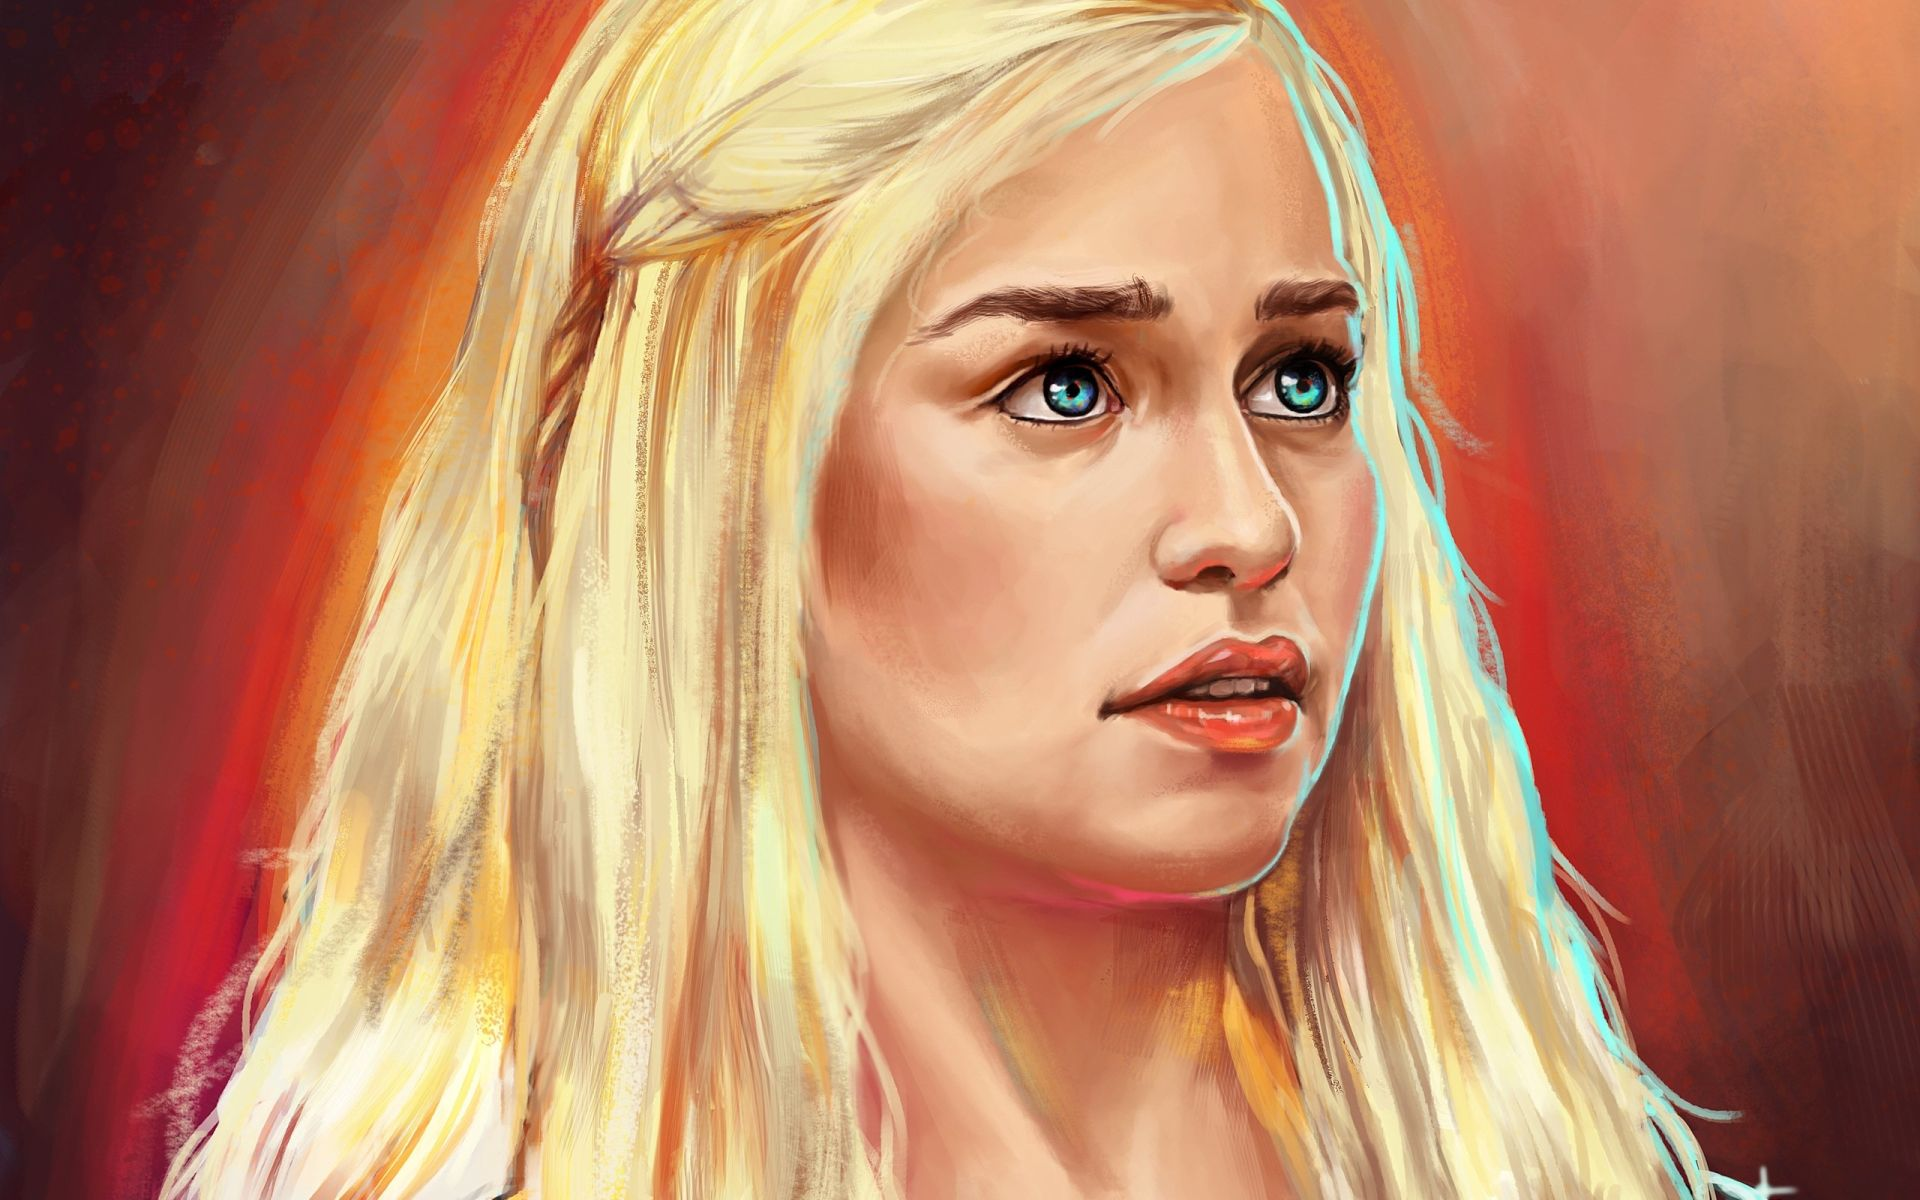 Game of Thrones Daenerys Targaryen face fan art